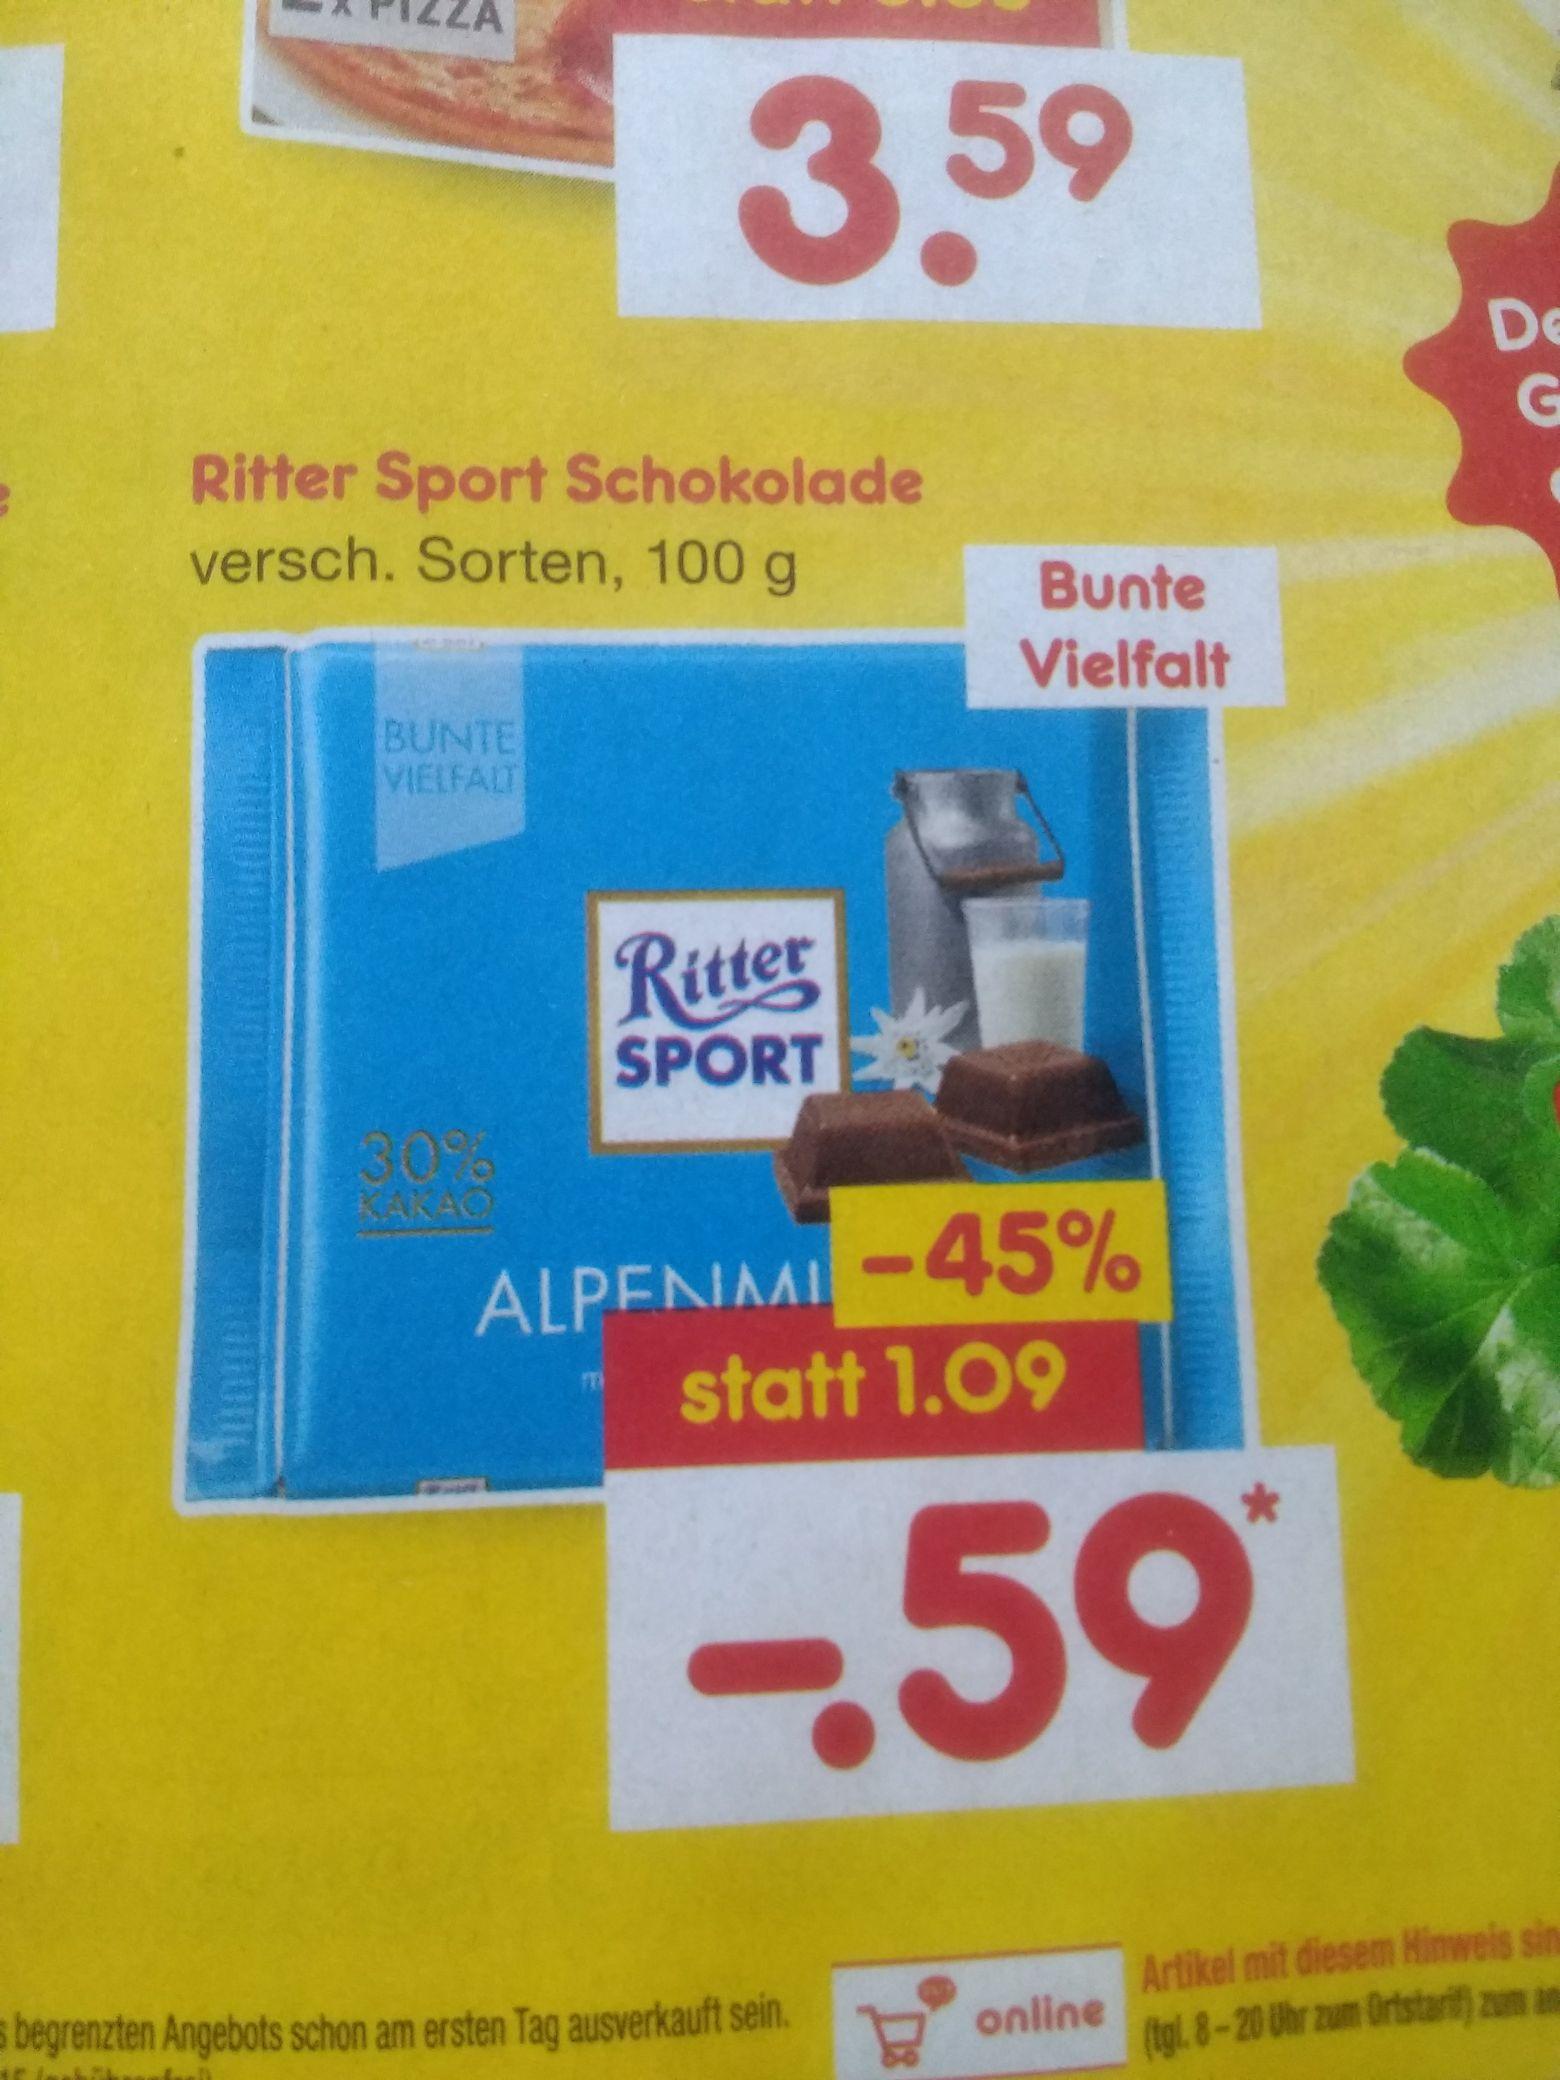 Netto (ohne Hund): Ritter Sport Schokolade 0,59€